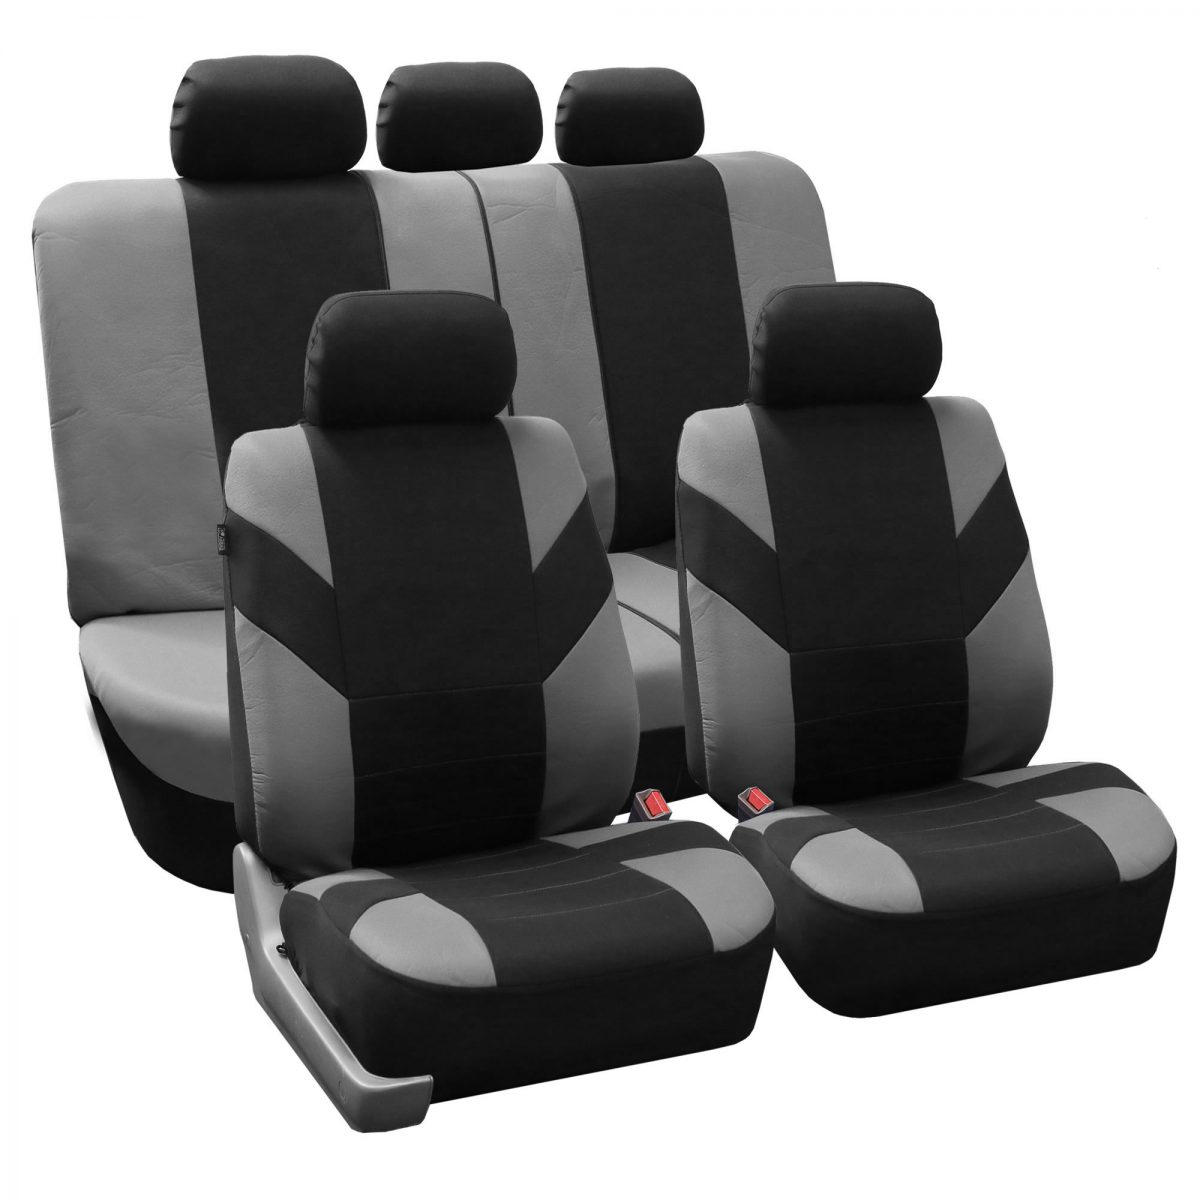 Road Master Seat Covers - Full Set FB072gray115